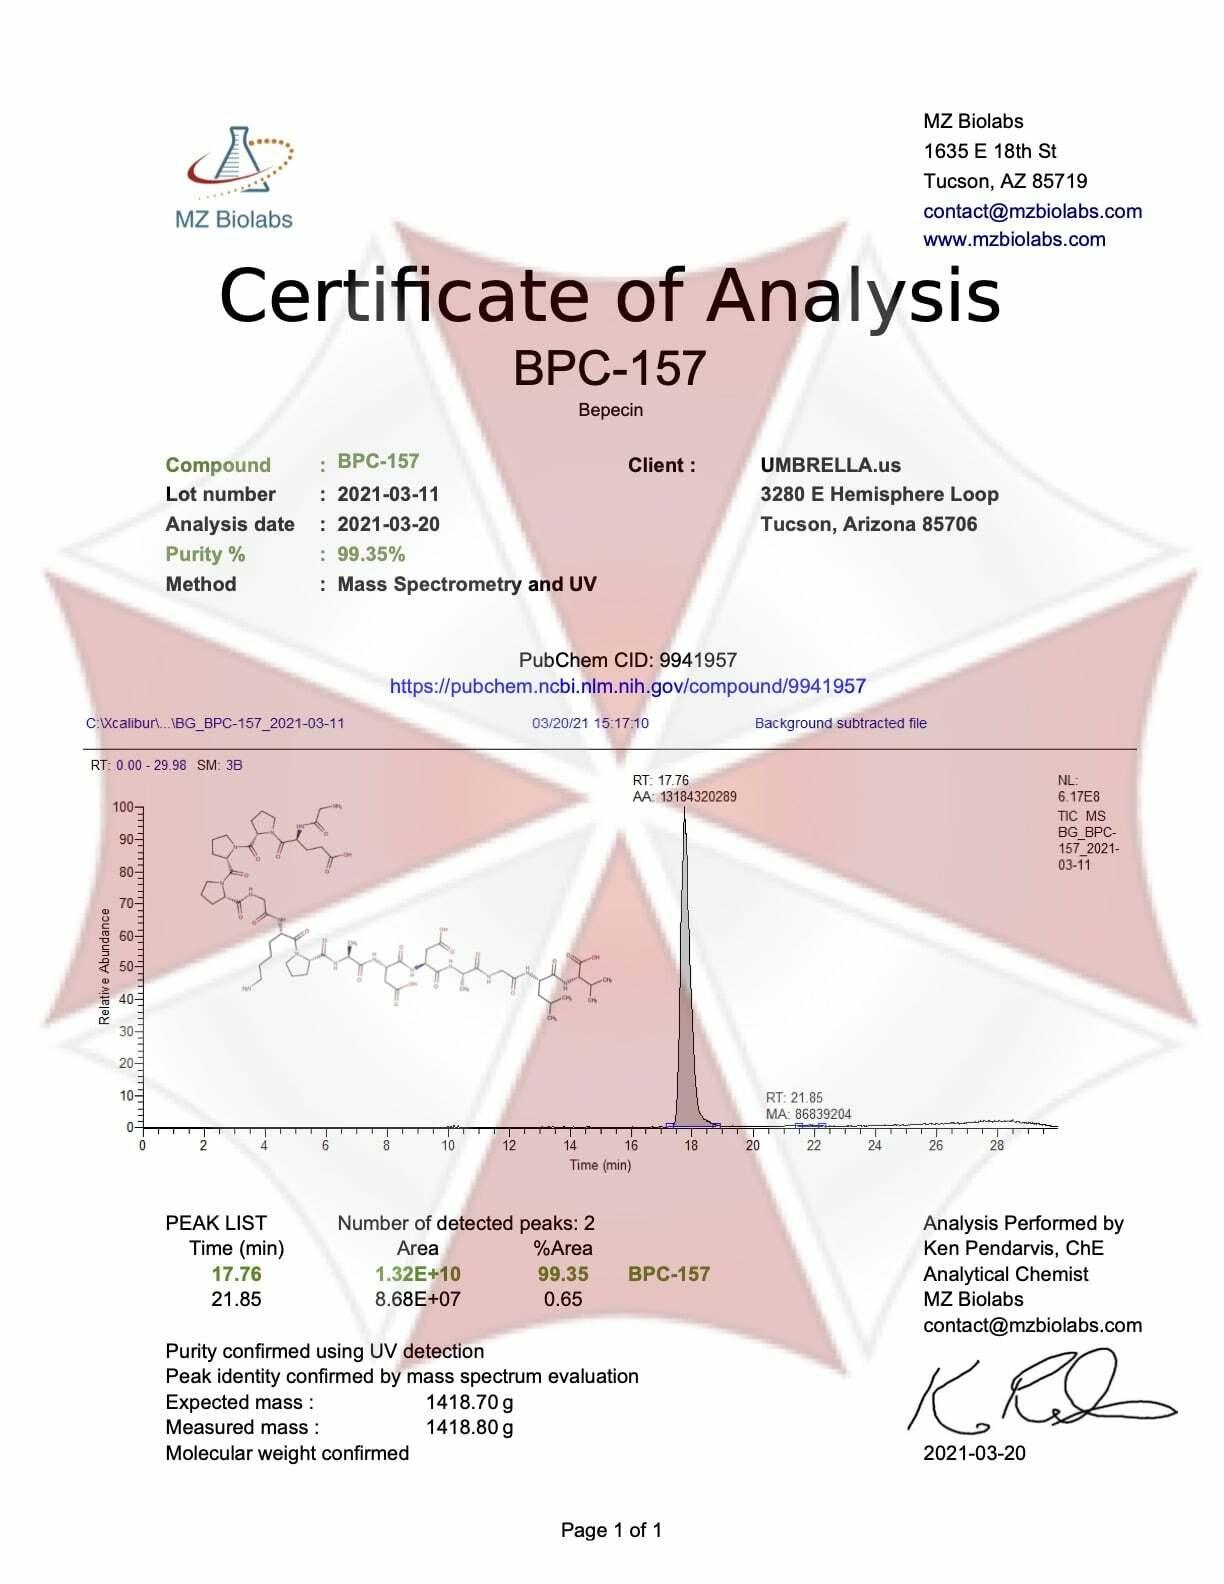 BPC-157 certificate